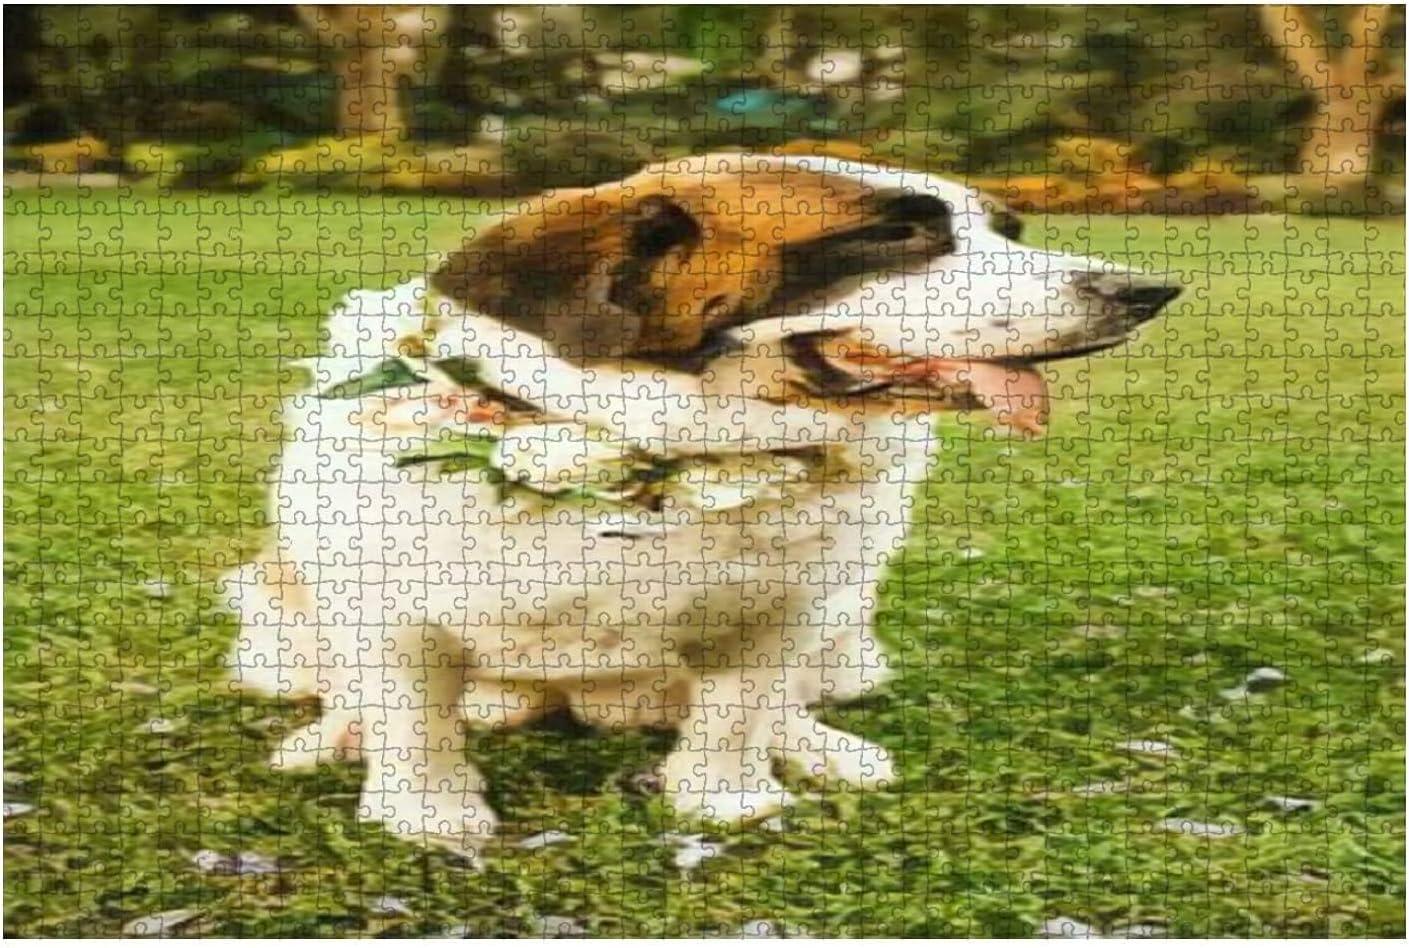 1000 Pieces-Saint Bernard Dog Ready 5% OFF Ceremony Wedding for Wooden